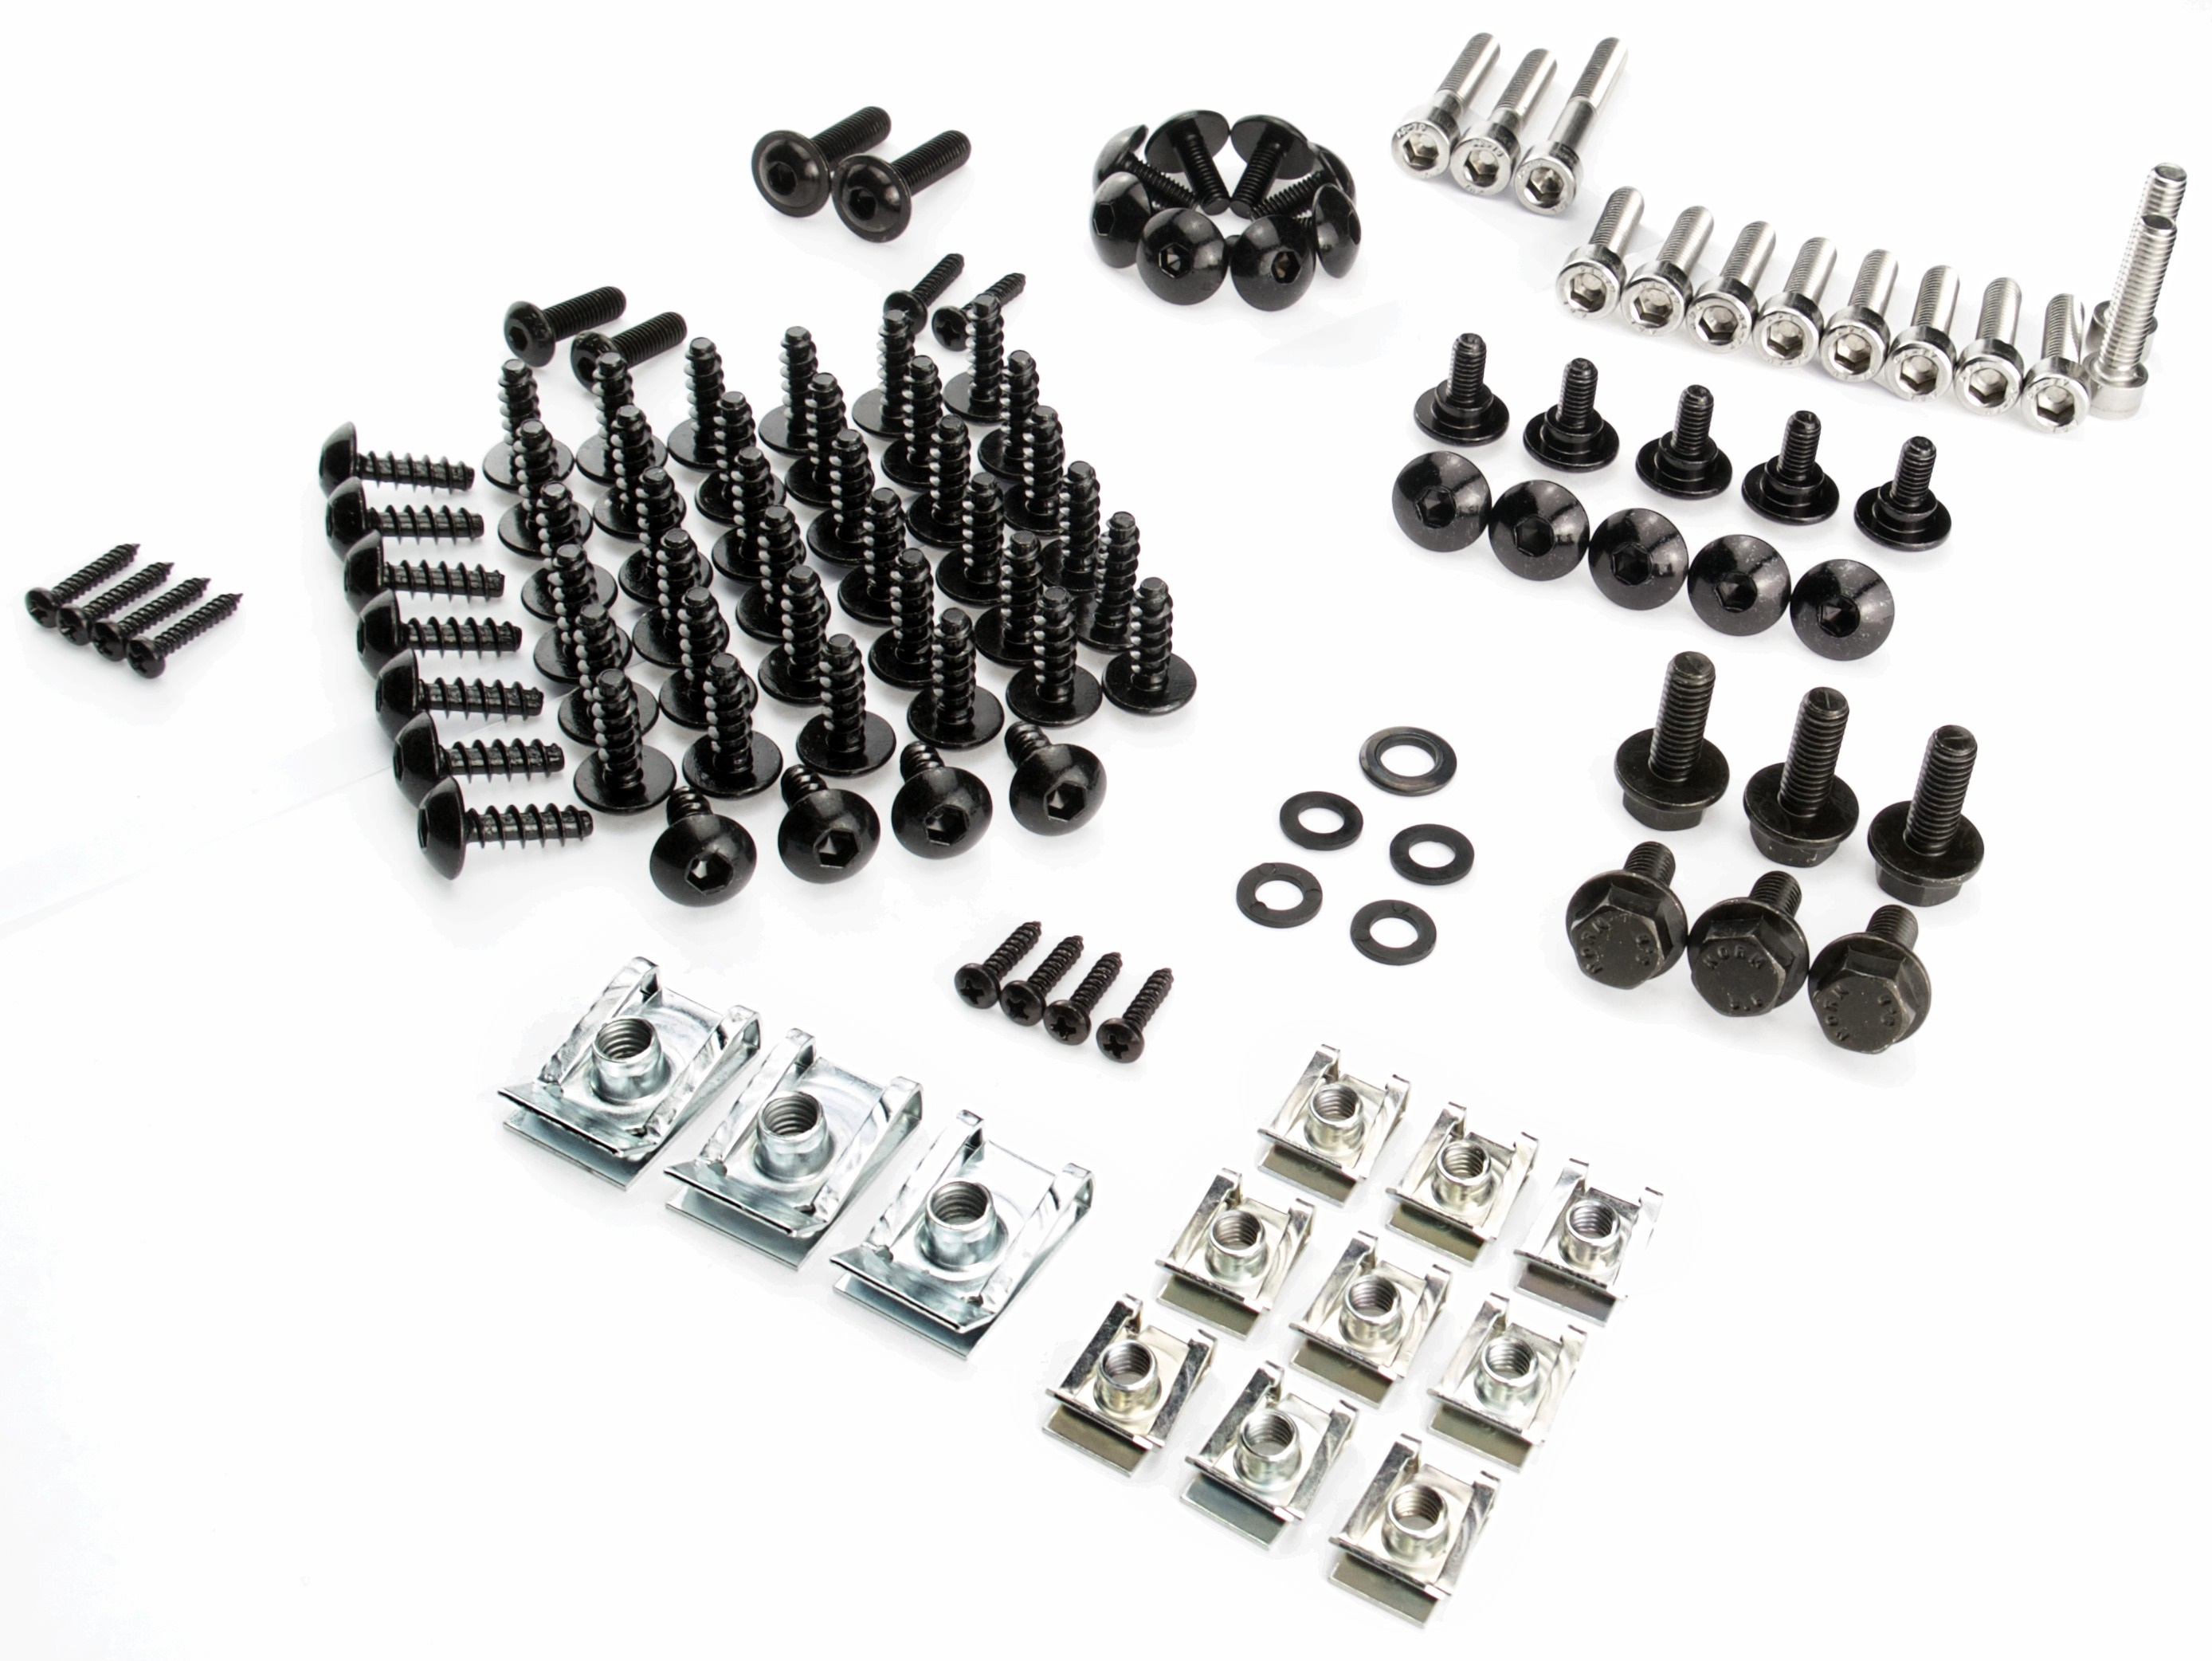 3050mm Auswahl: L/änge 1000 mm B/ördel E E Bremsleitung /Ø 4,75 mm einbaufertig geb/ördelt mit Nippel 160mm